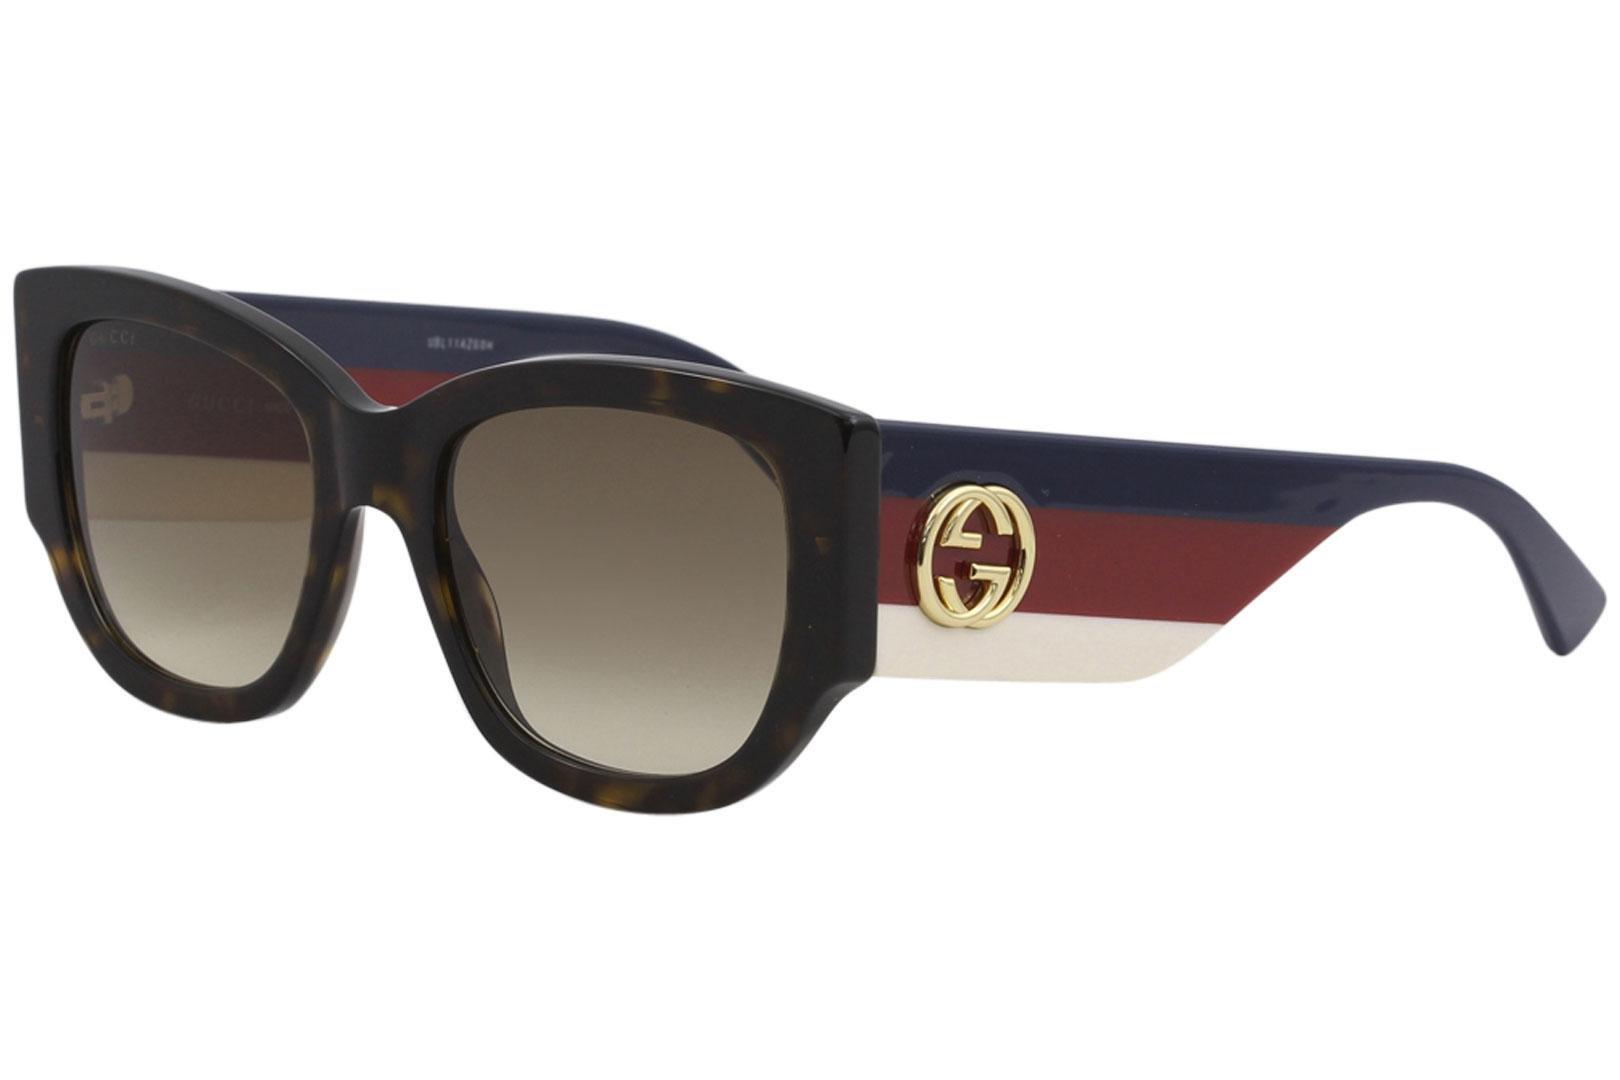 699a728bb26 Authentic Gucci Sunglasses GG0276S 002 53mm Havana-Tri Color   Brown ...